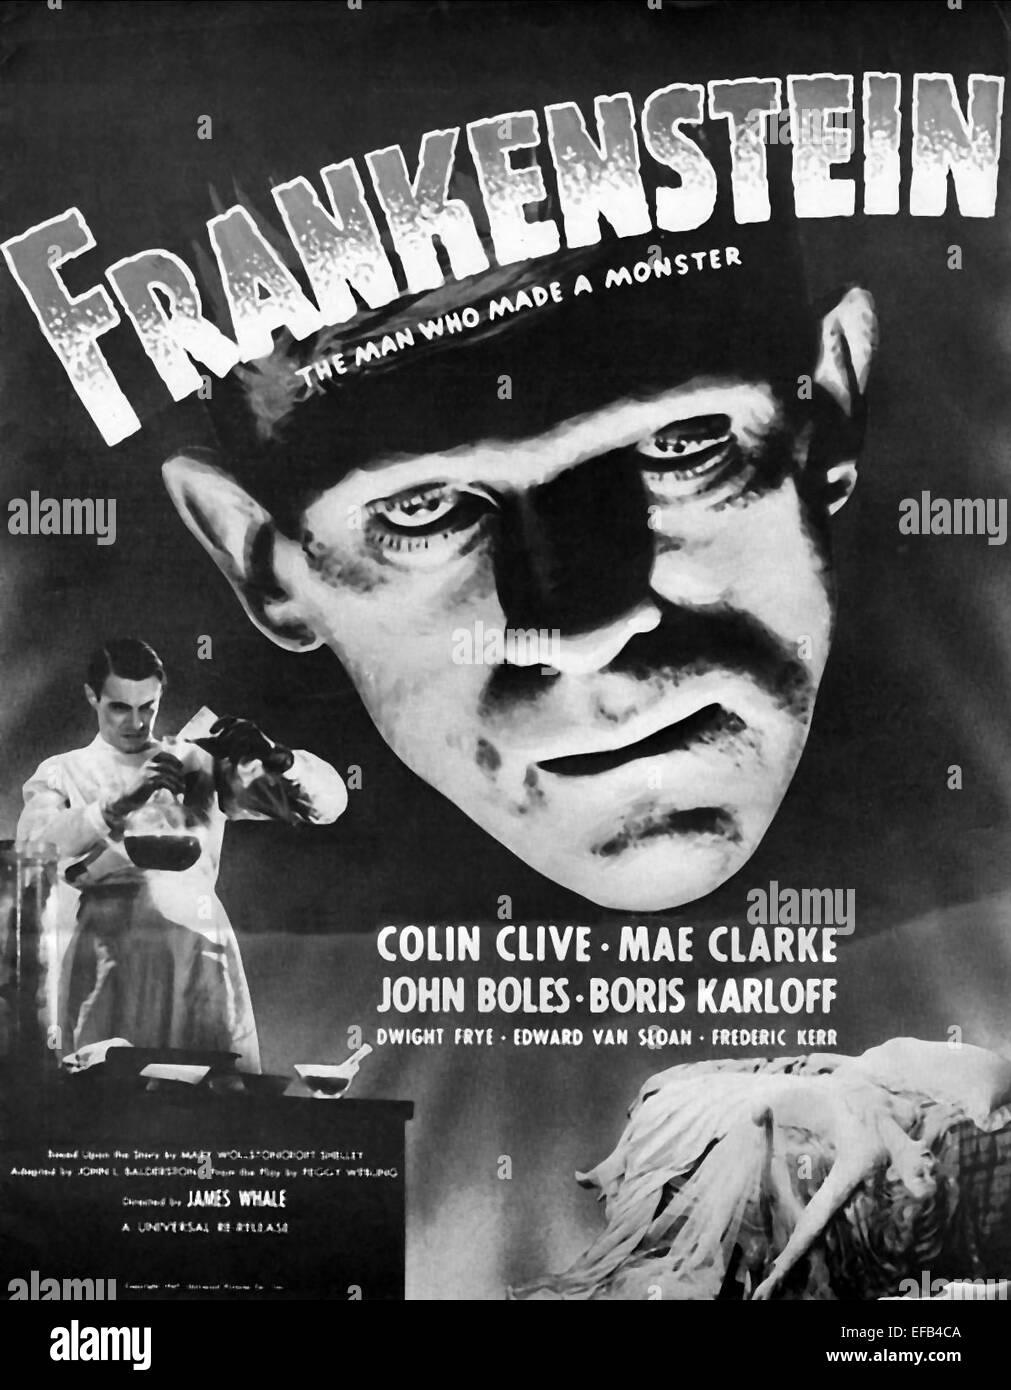 FIL877 Frankenstein Portrait 1931 Movie Poster Glossy Finish MCPoster